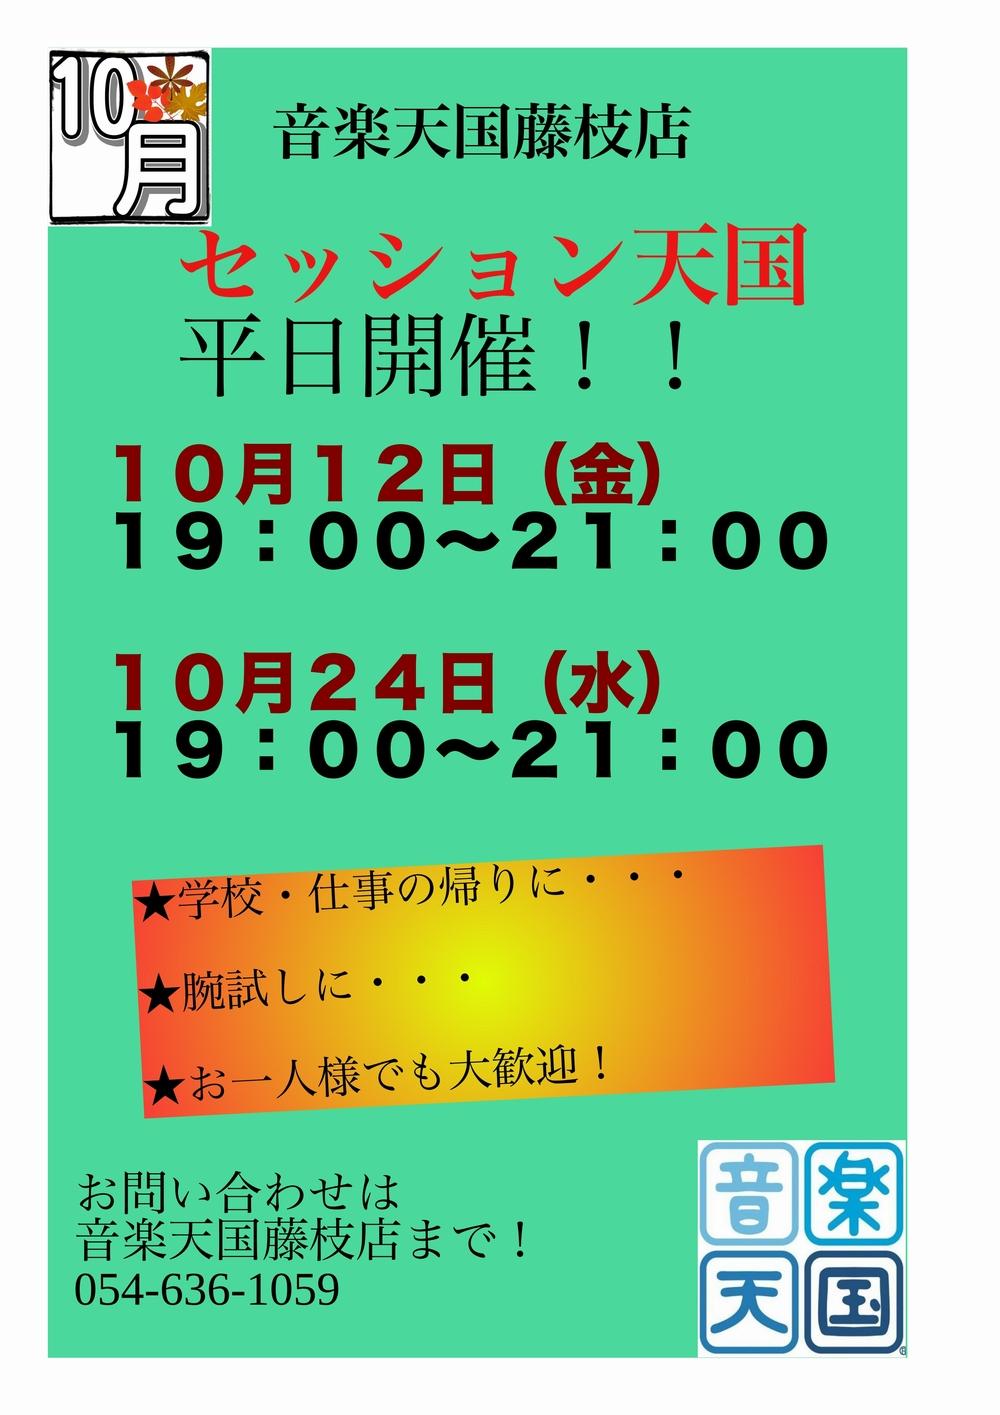 【セッション天国】音楽天国・藤枝店10月12日(金)・24日(水)開催